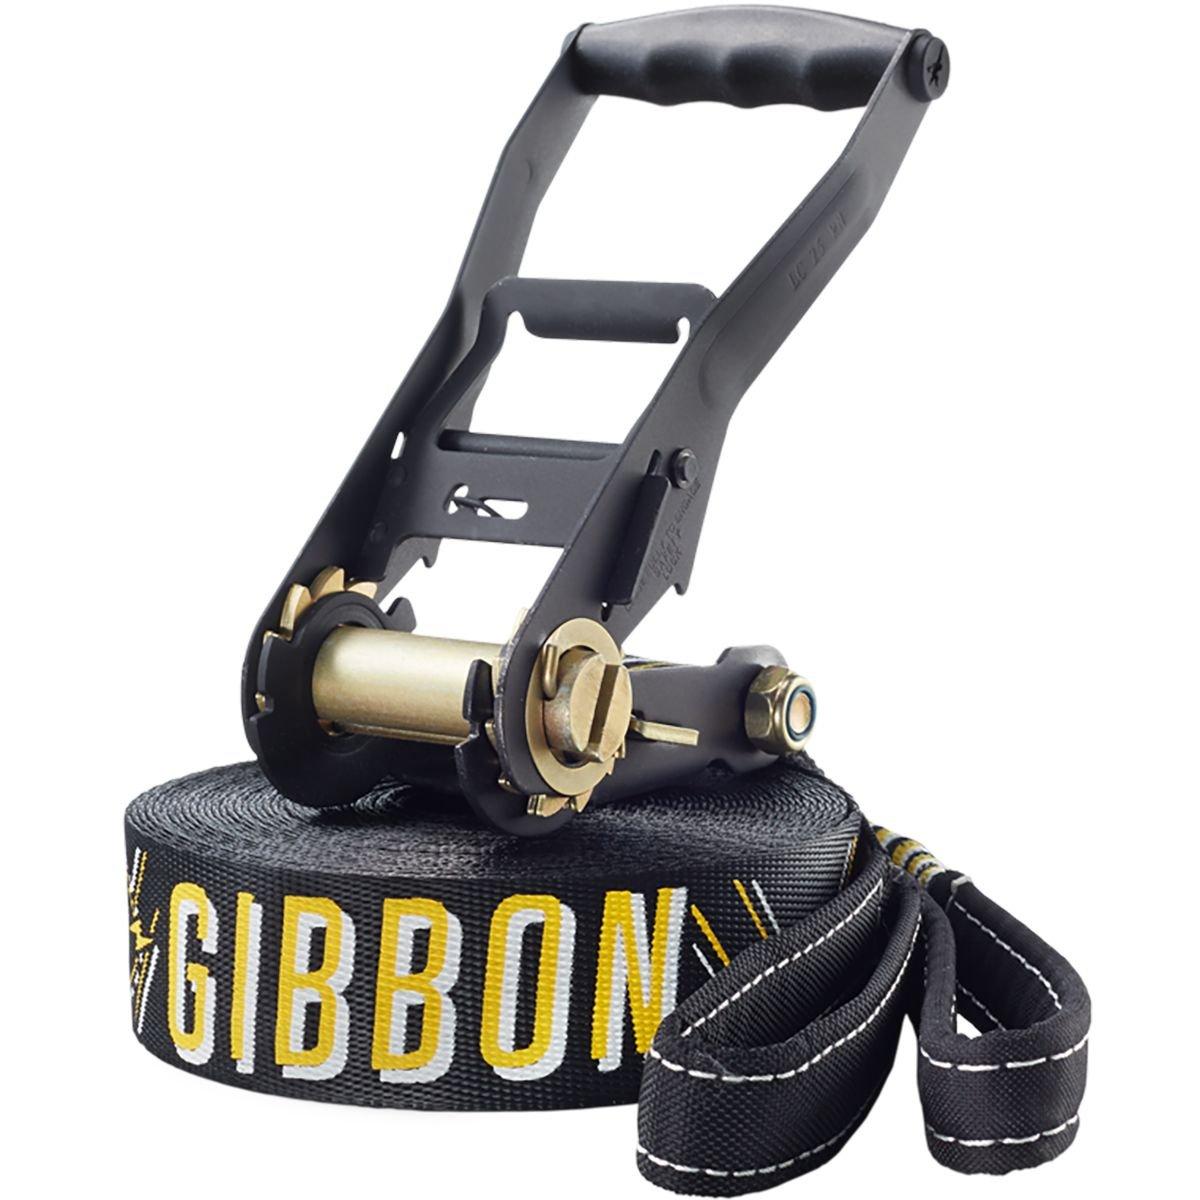 Gibbon Slacklines - Jibline, Black, 49-Feet by Gibbon